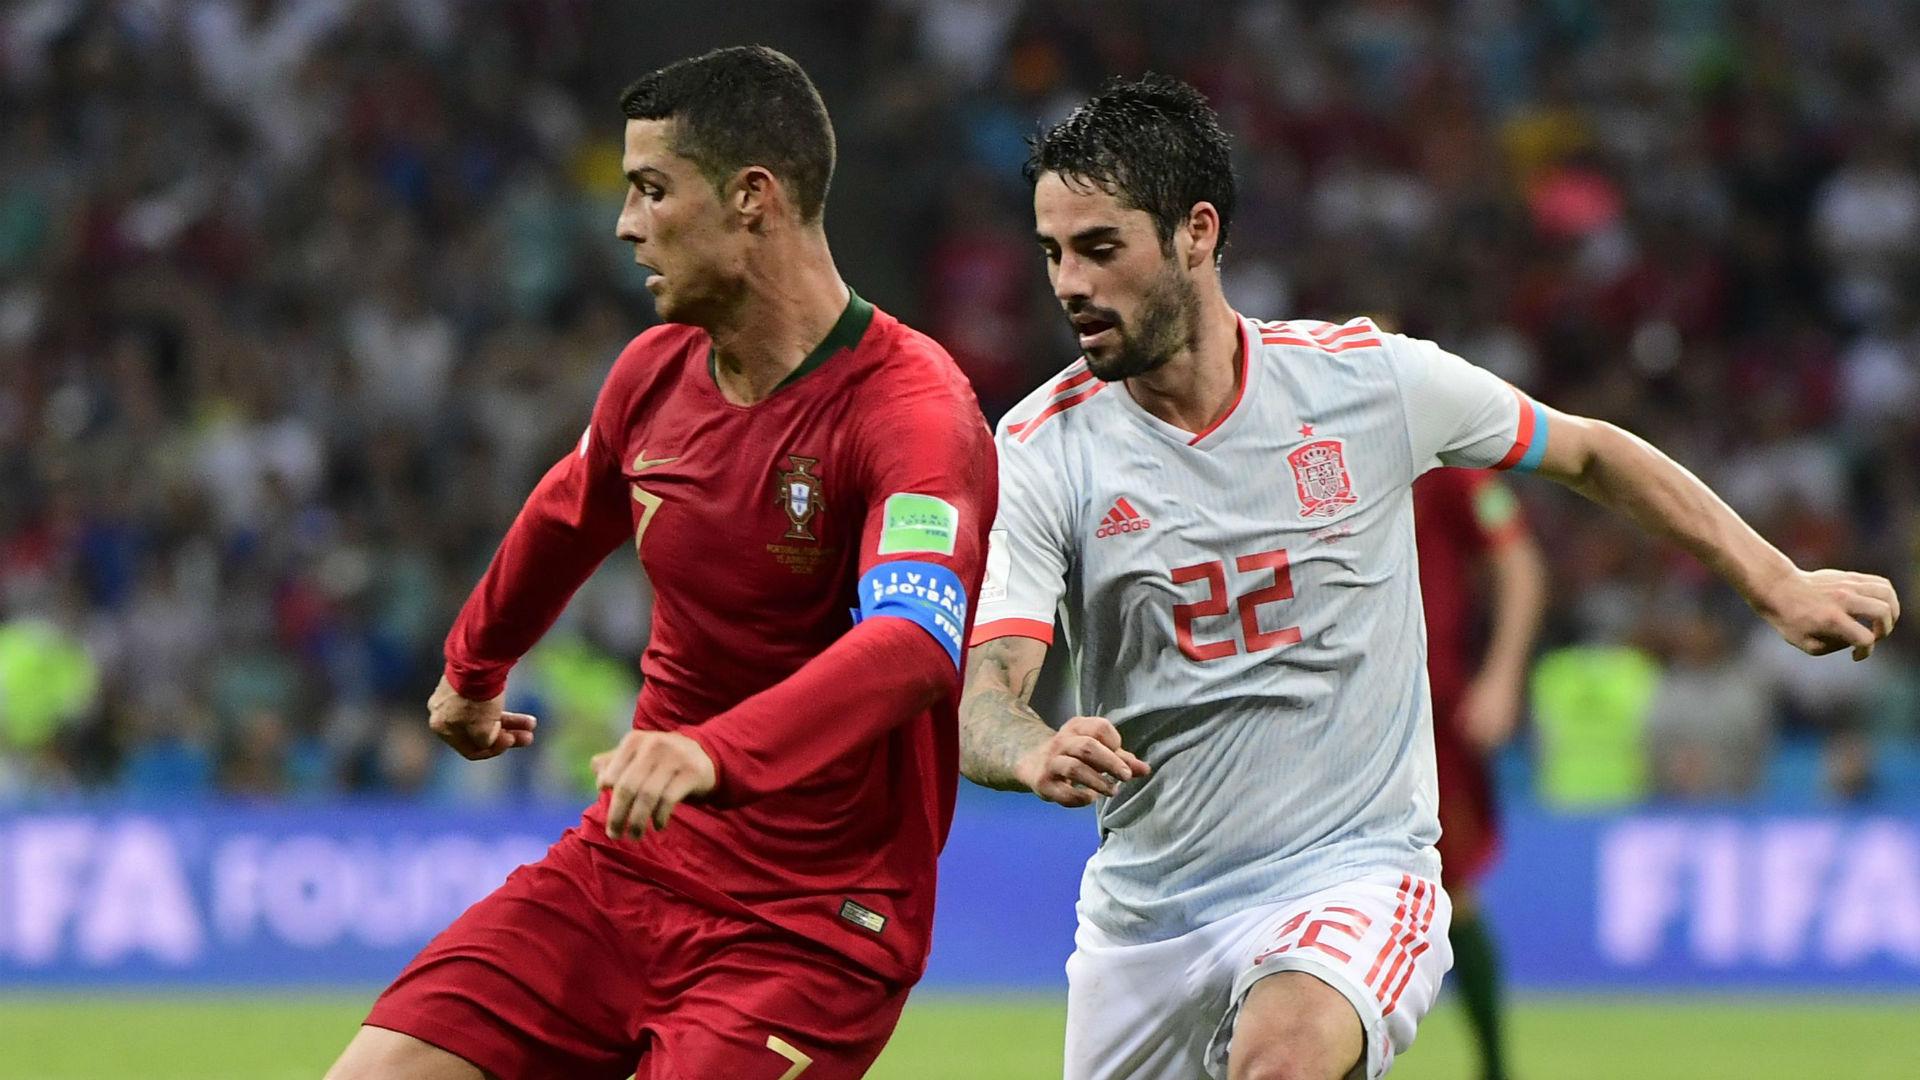 Cristiano-ronaldo-isco-portugal-spain-world-cup-2018_caefzj0h041j1hjo6fl842o02